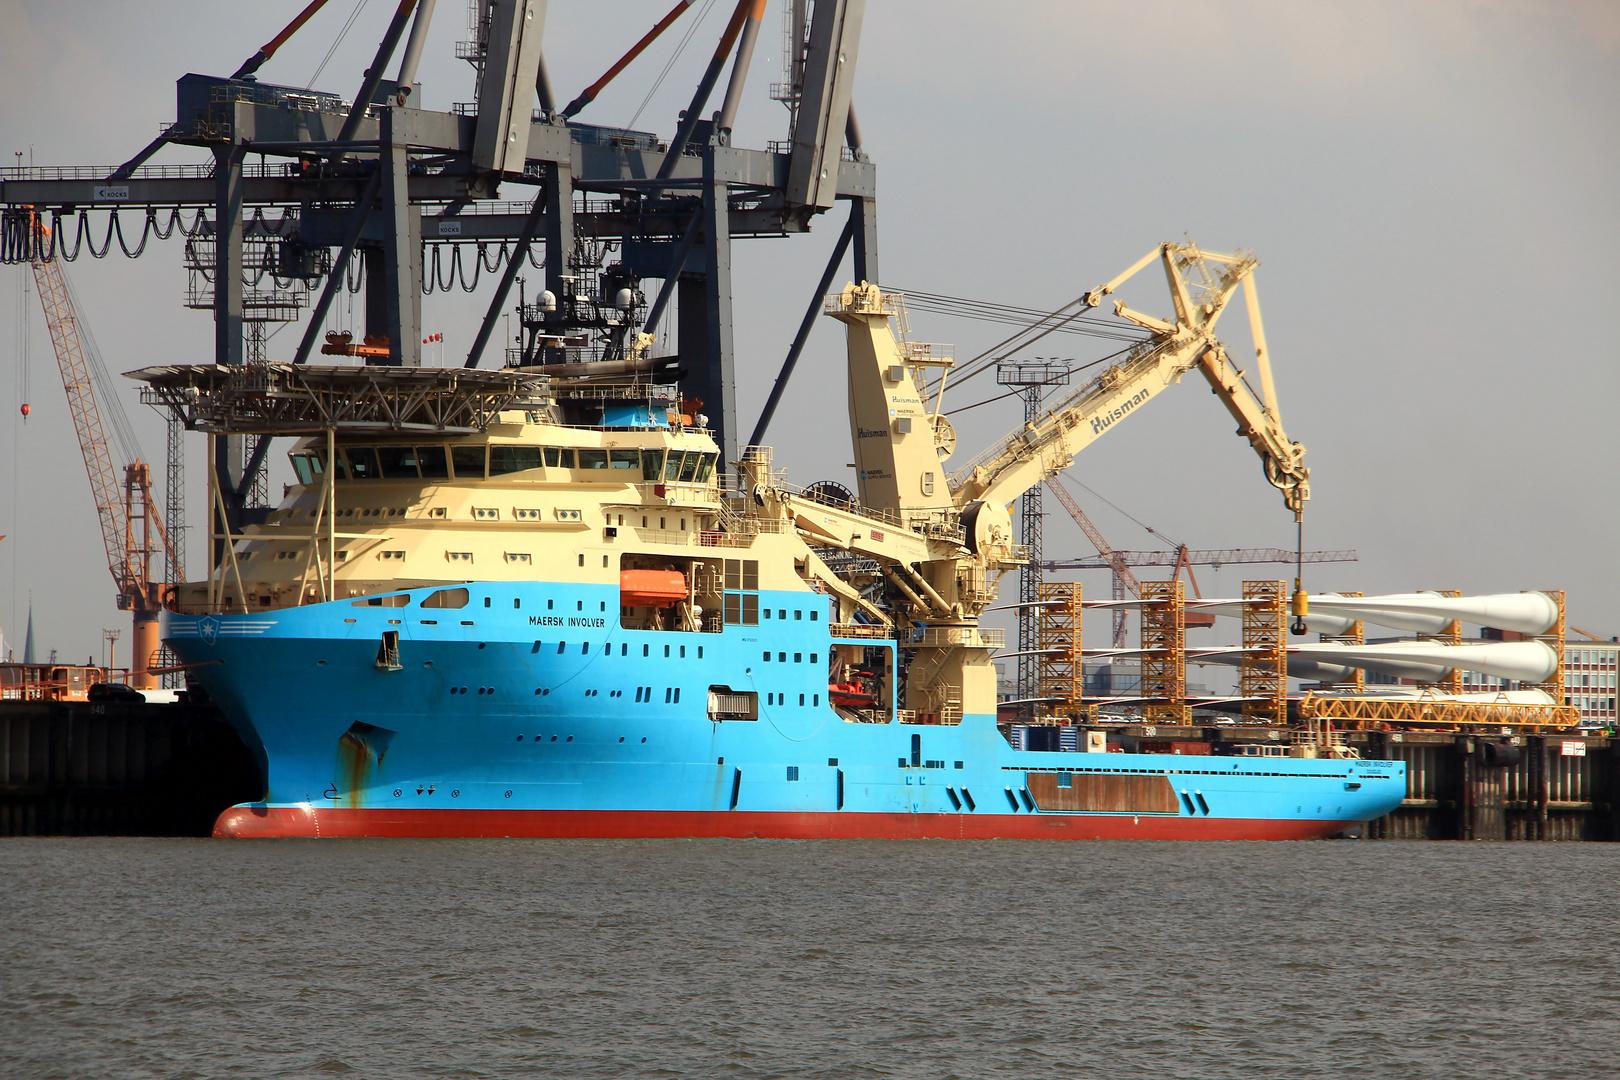 Maersk Involver